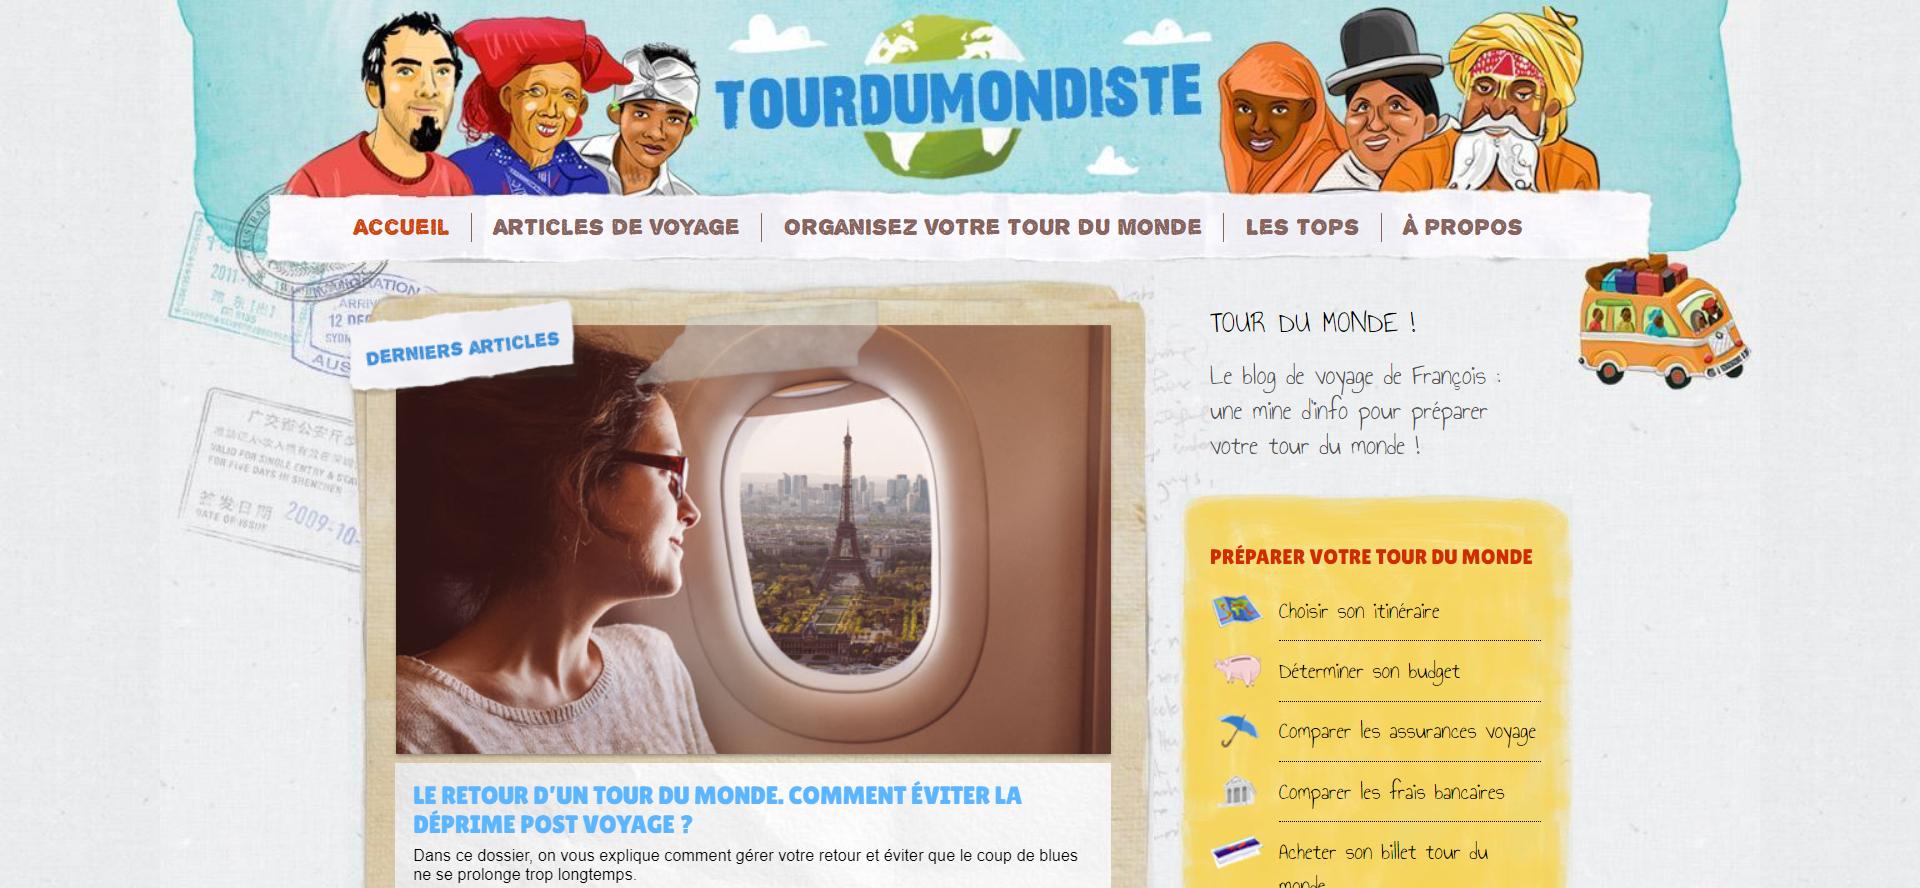 Blog tourdumondiste